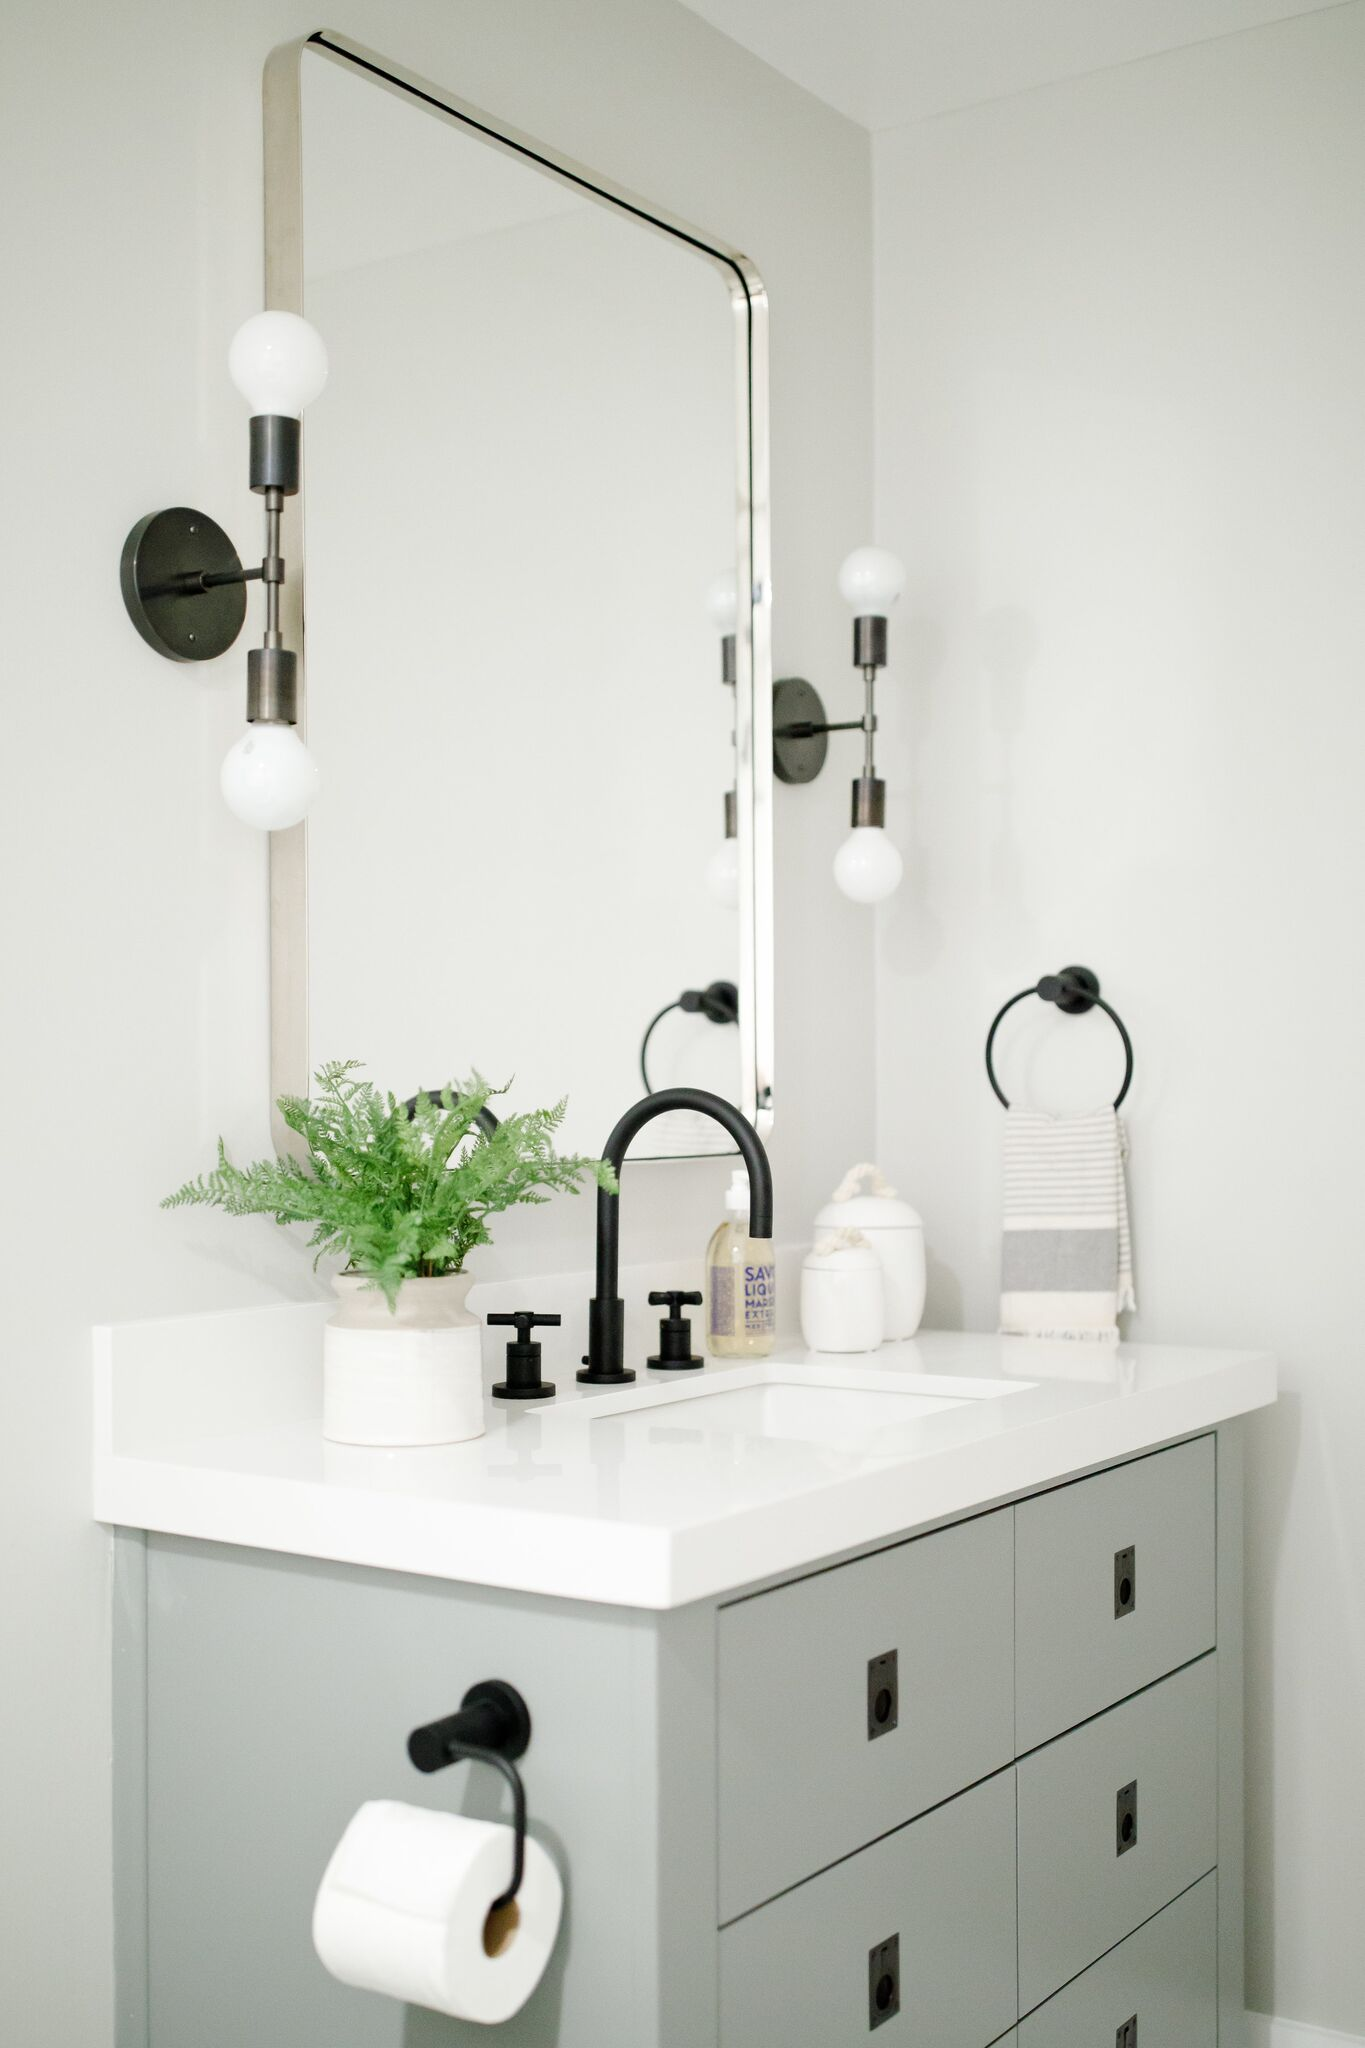 Rangeview Reno Pt 2 Kitchen Bathrooms Bathroom Redecorating Timeless Bathroom Stylish Bathroom